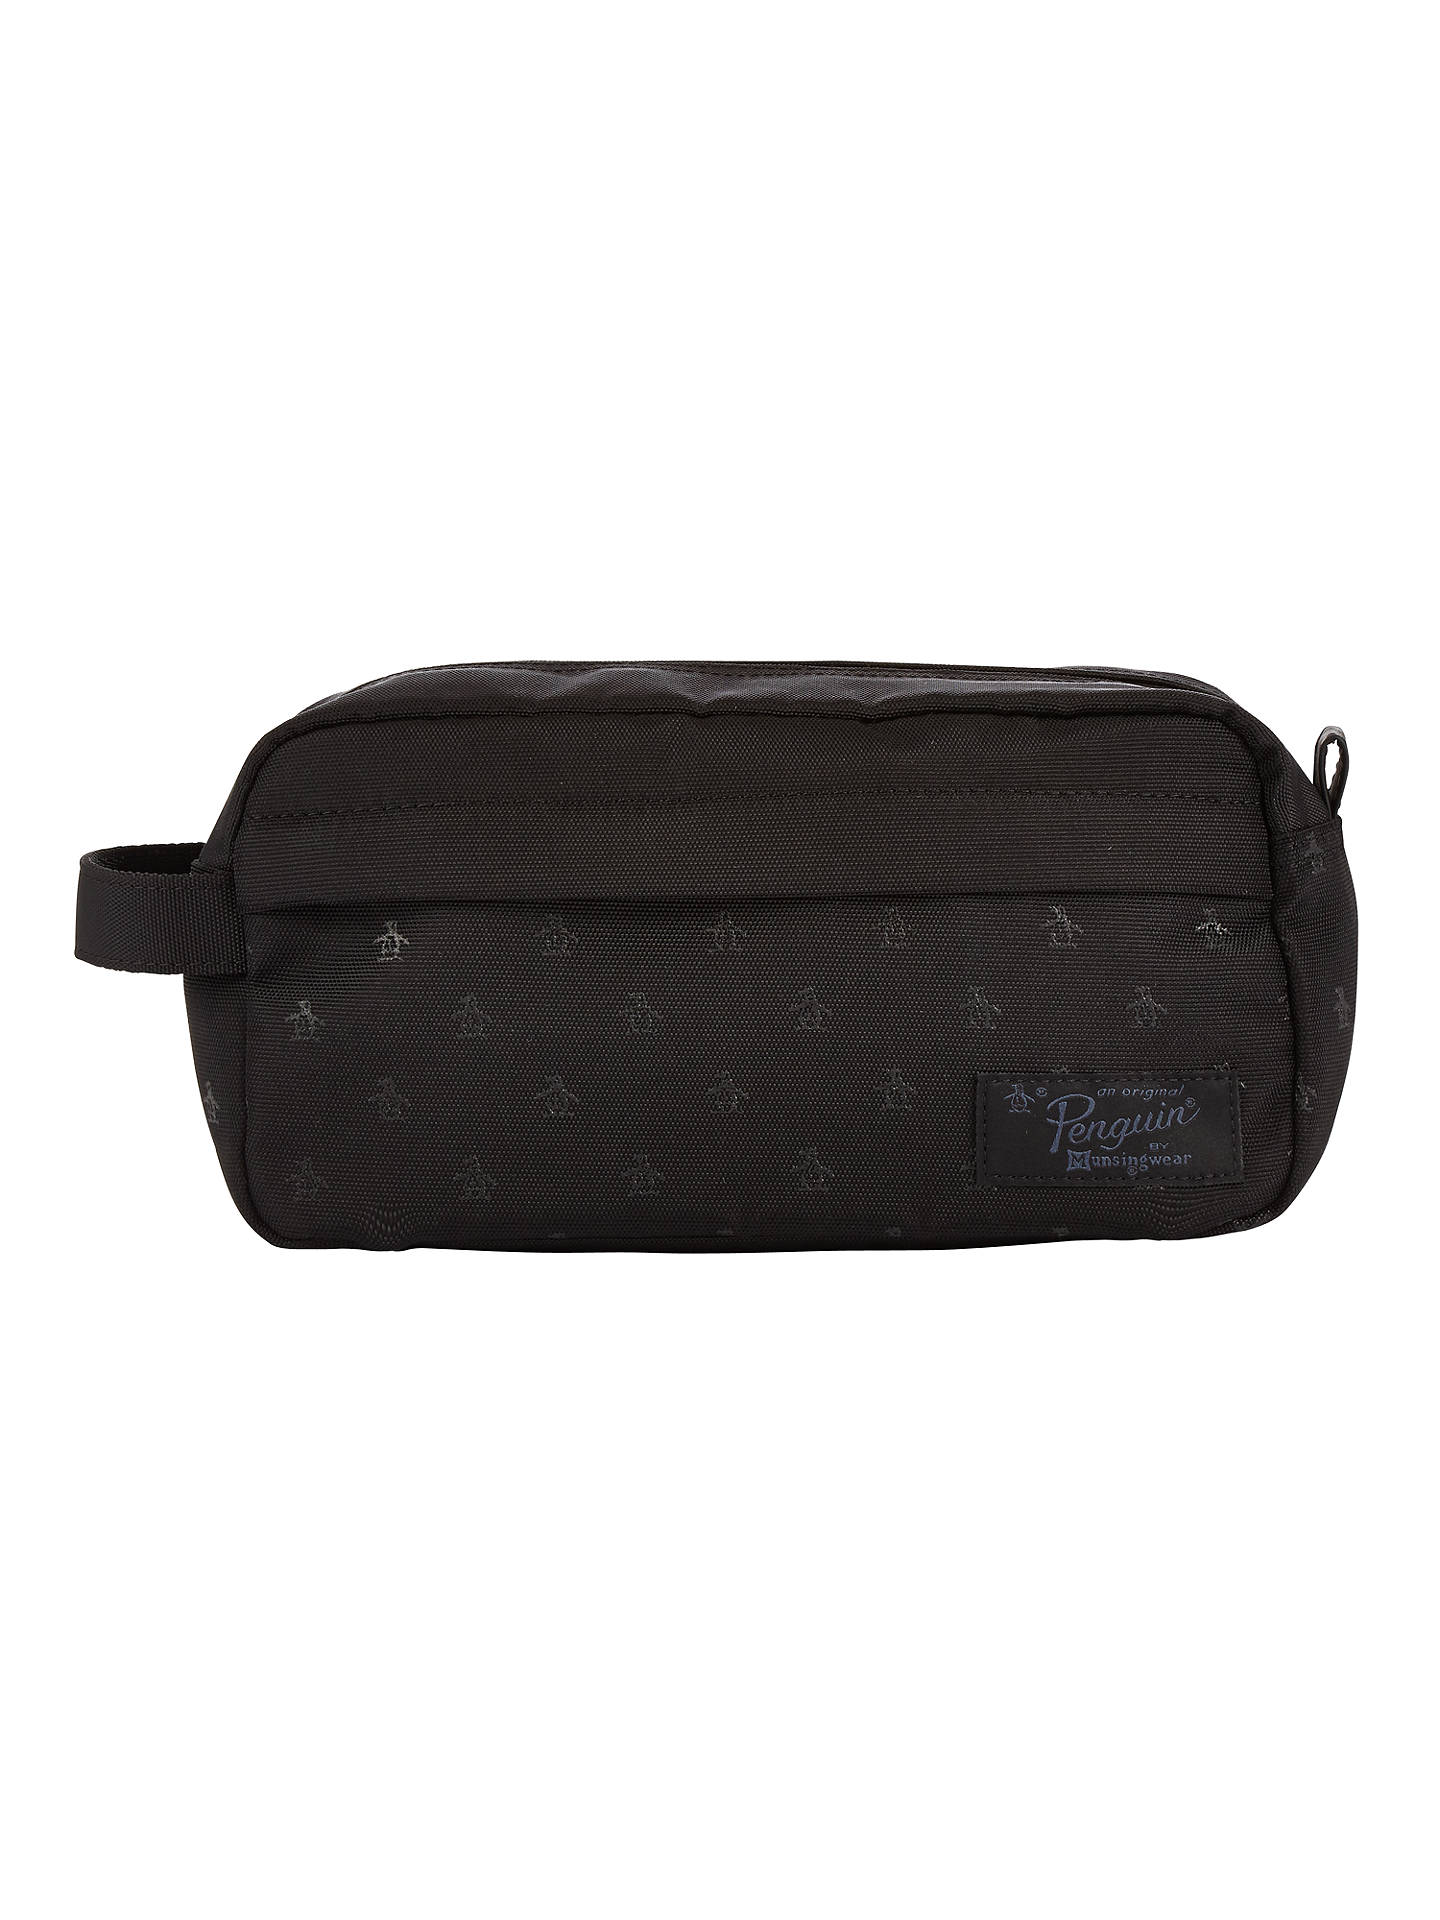 0b4829bd617 Buy Original Penguin Print Wash Bag, Black Online at johnlewis.com ...